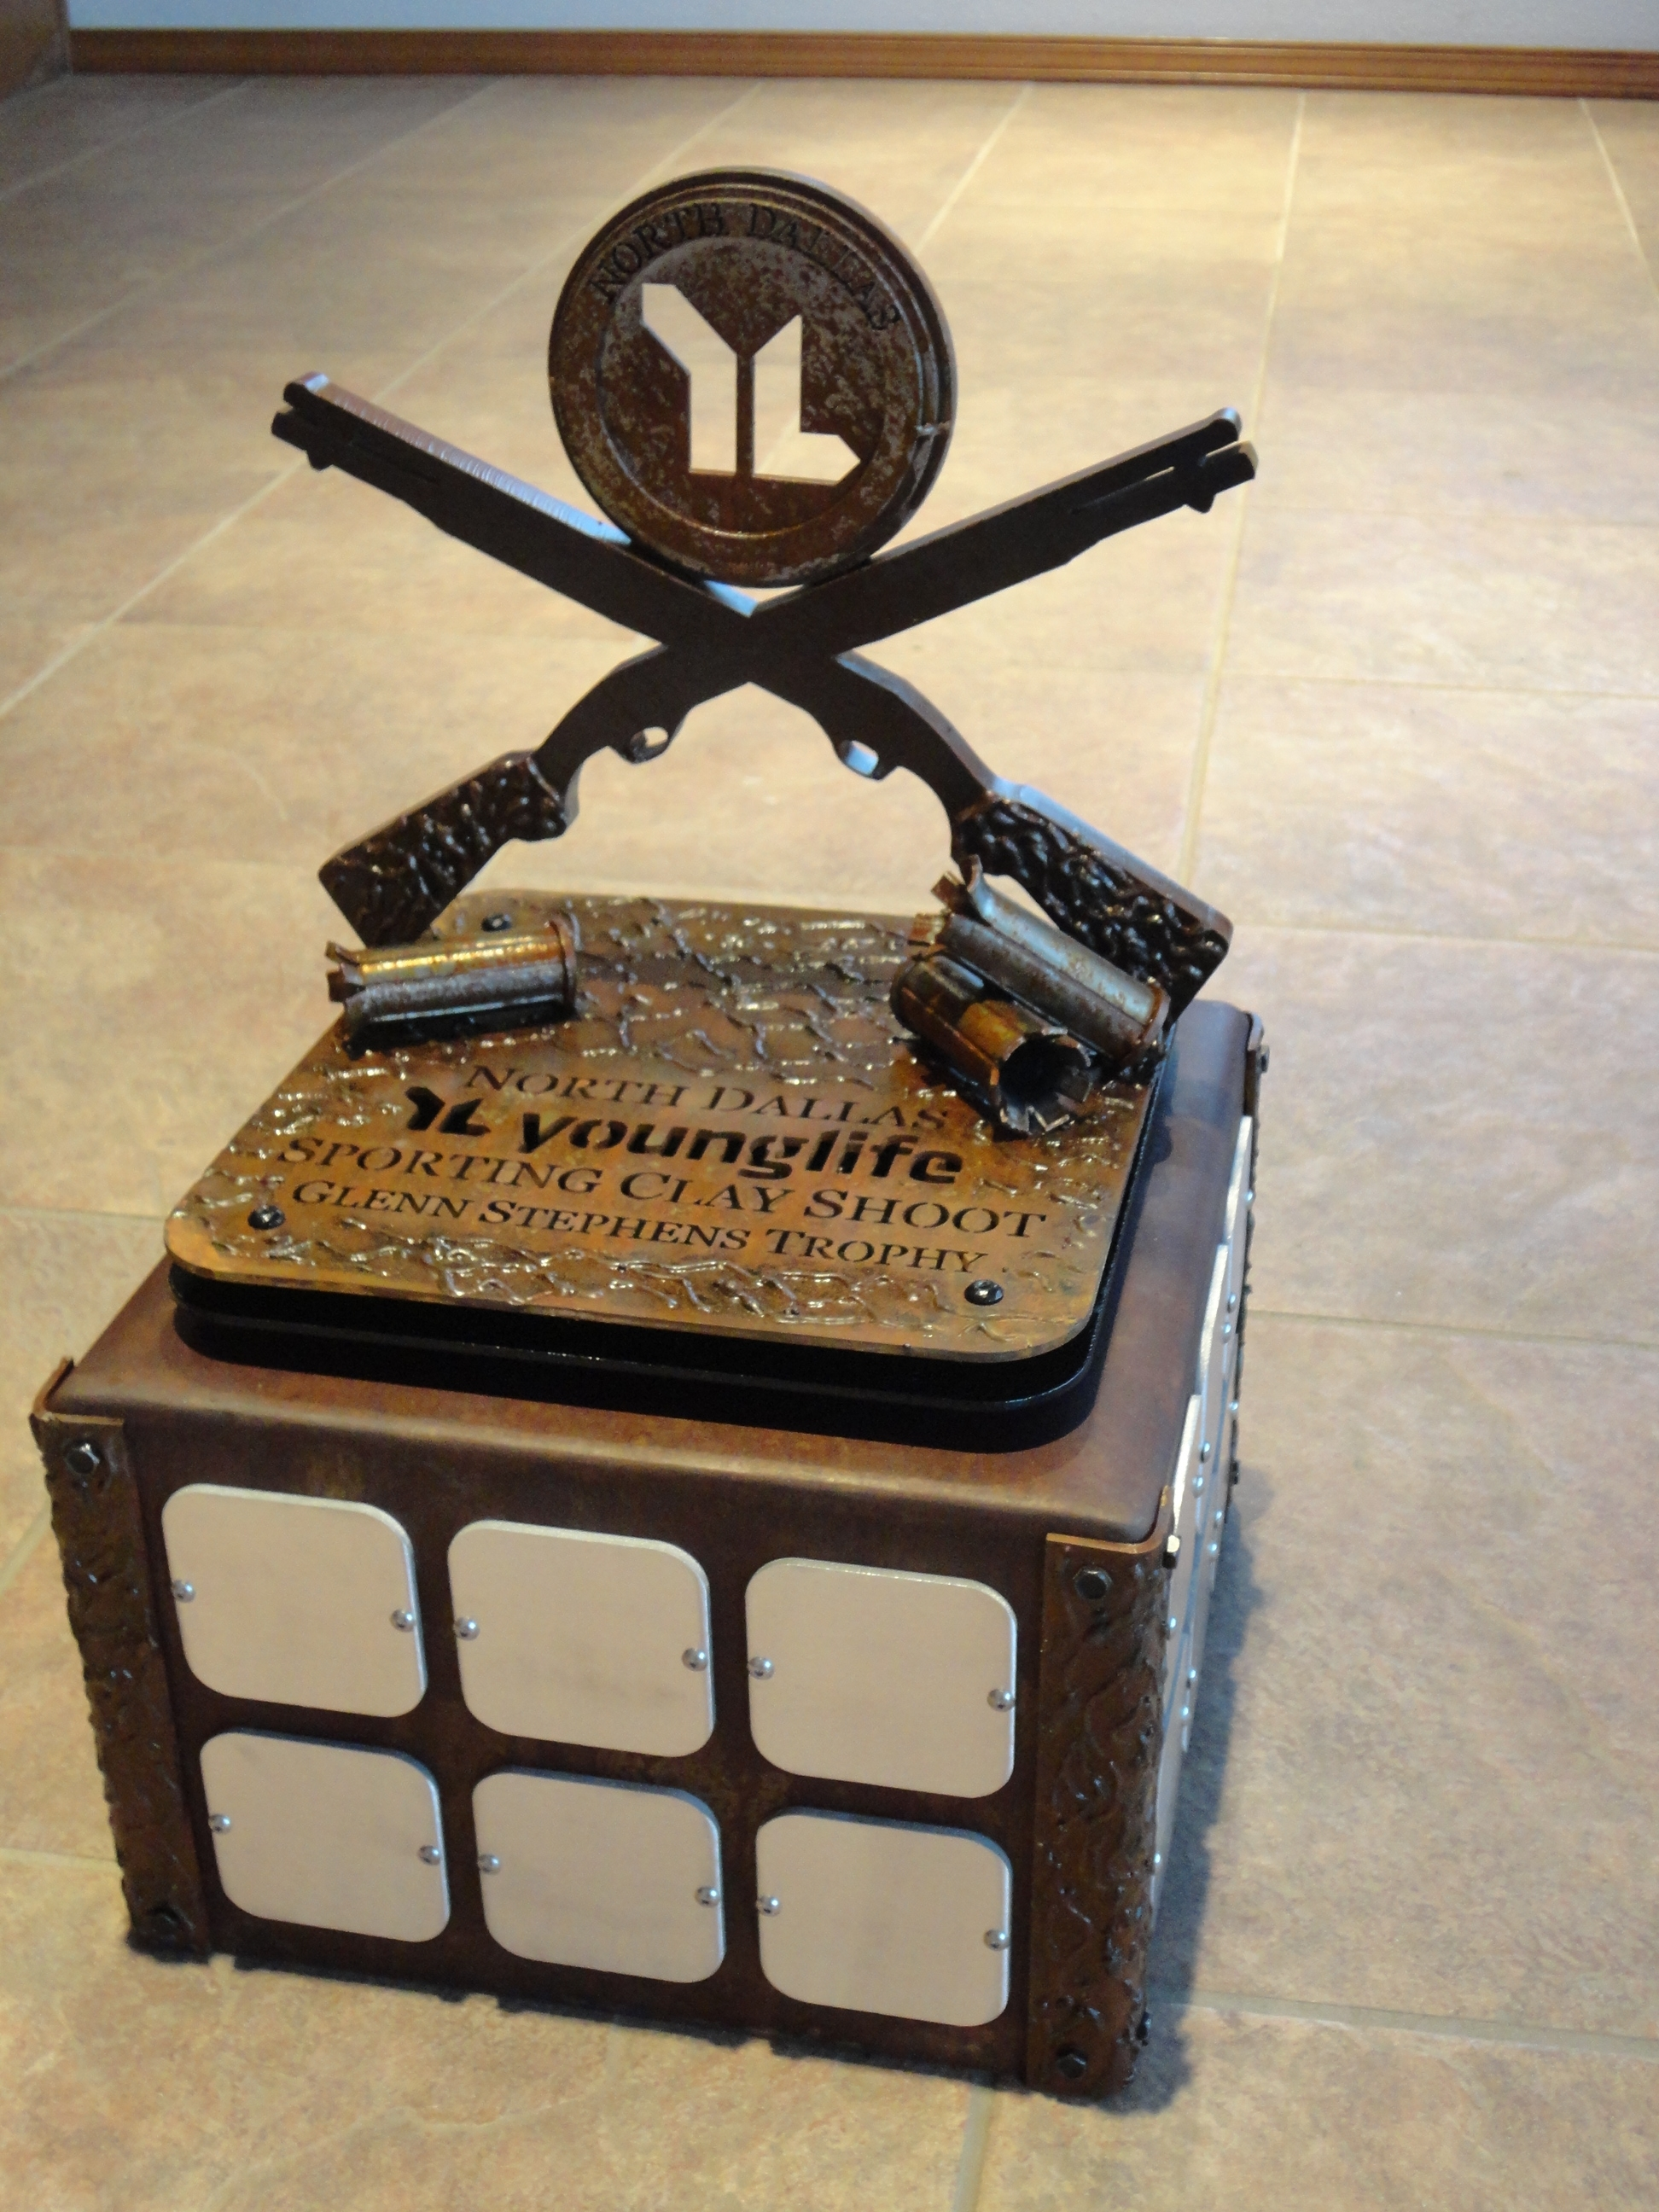 NORTH DALLAS -Sportsman Trophy